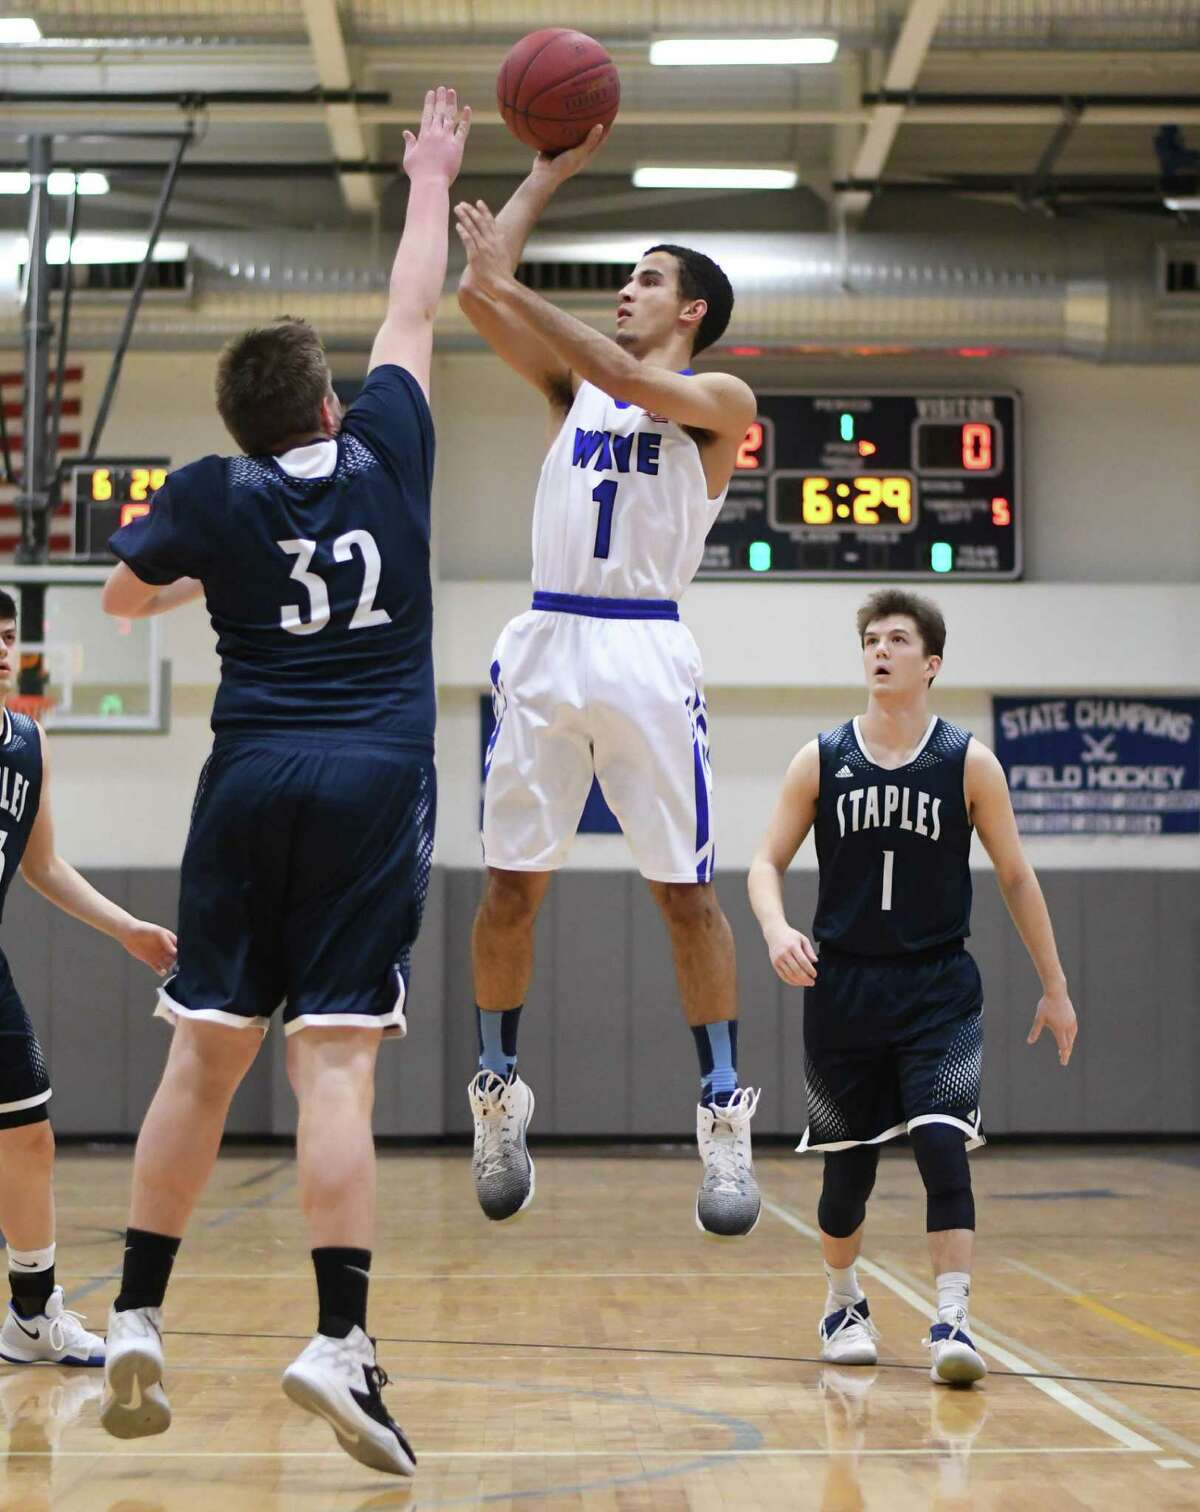 Zak Swetye of Darien takes a jump shot during Tuesday night's game against Staples at Darien High School.